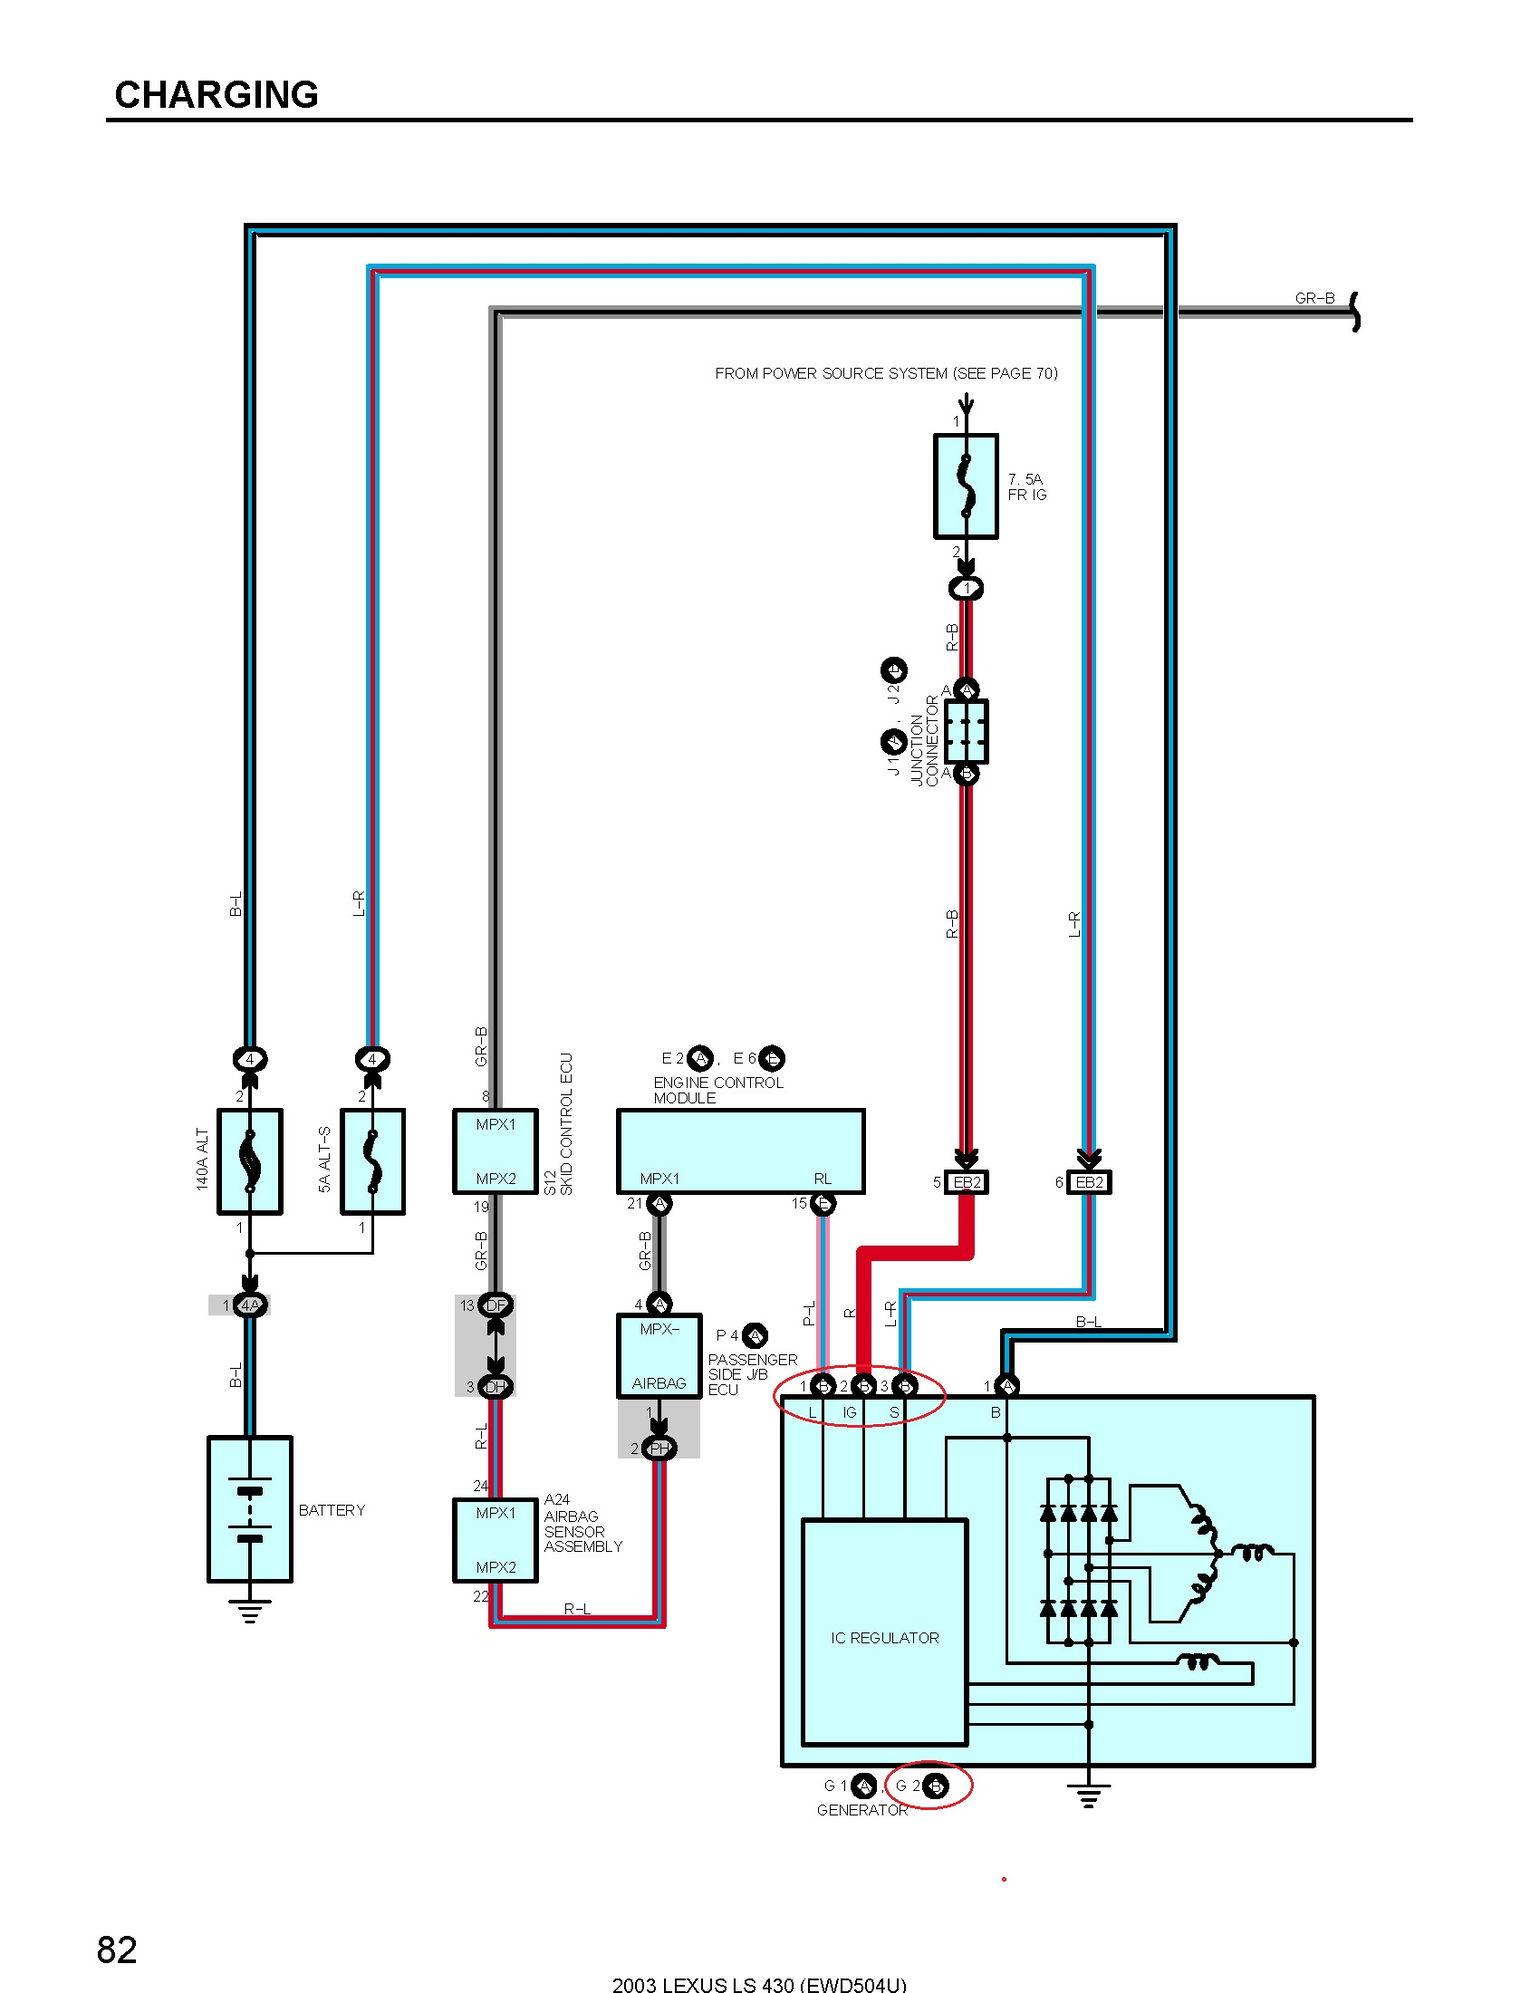 hight resolution of 2003 ls430 alternator wiring clublexus lexus forum 2001 lexus ls430 wiring diagram 2001 lexus ls430 wiring